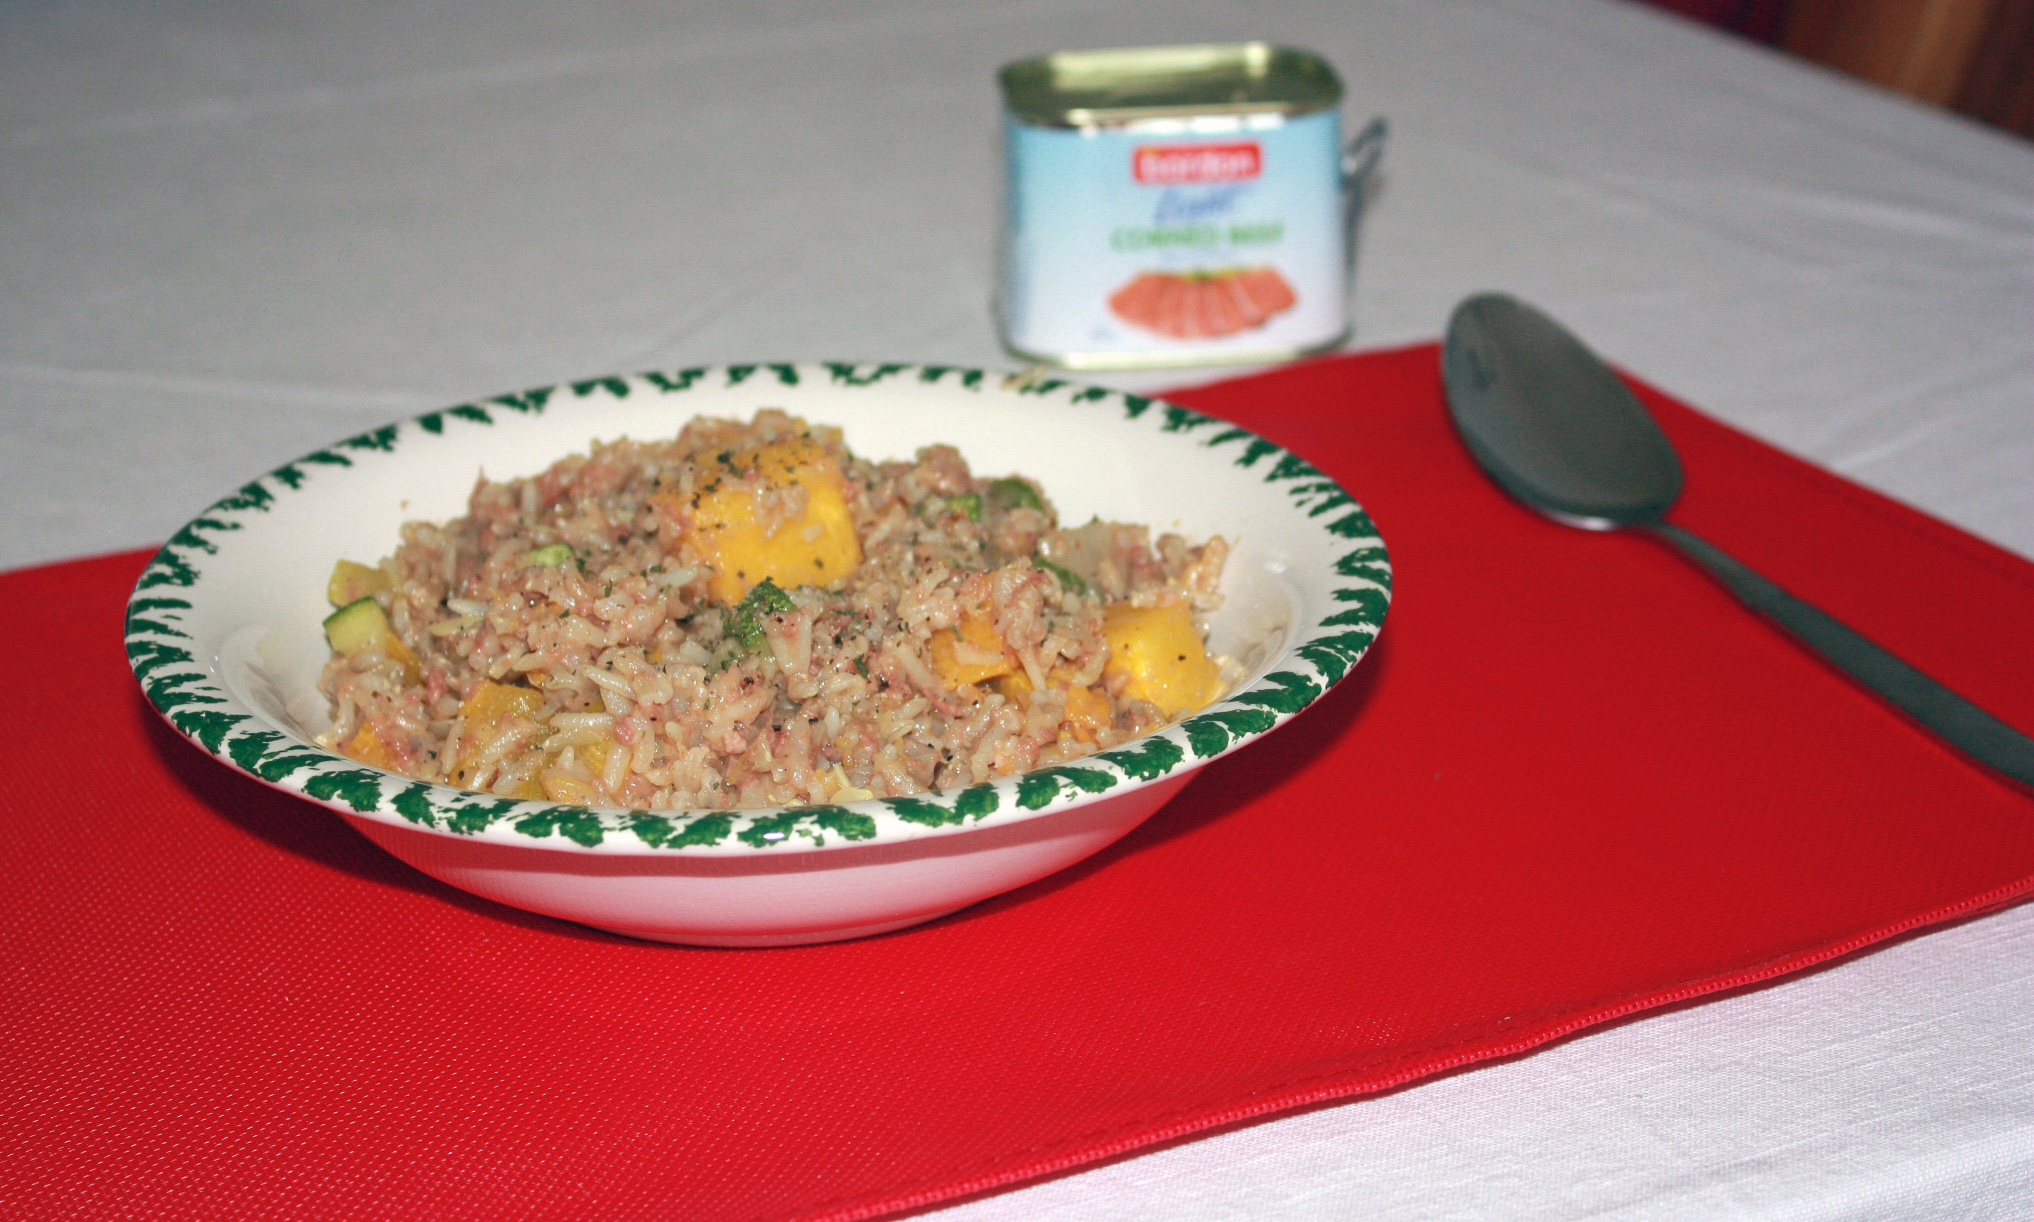 Abigail Cutajar BORDON Recipe: Pumpkin, marrow and corned beef risotto